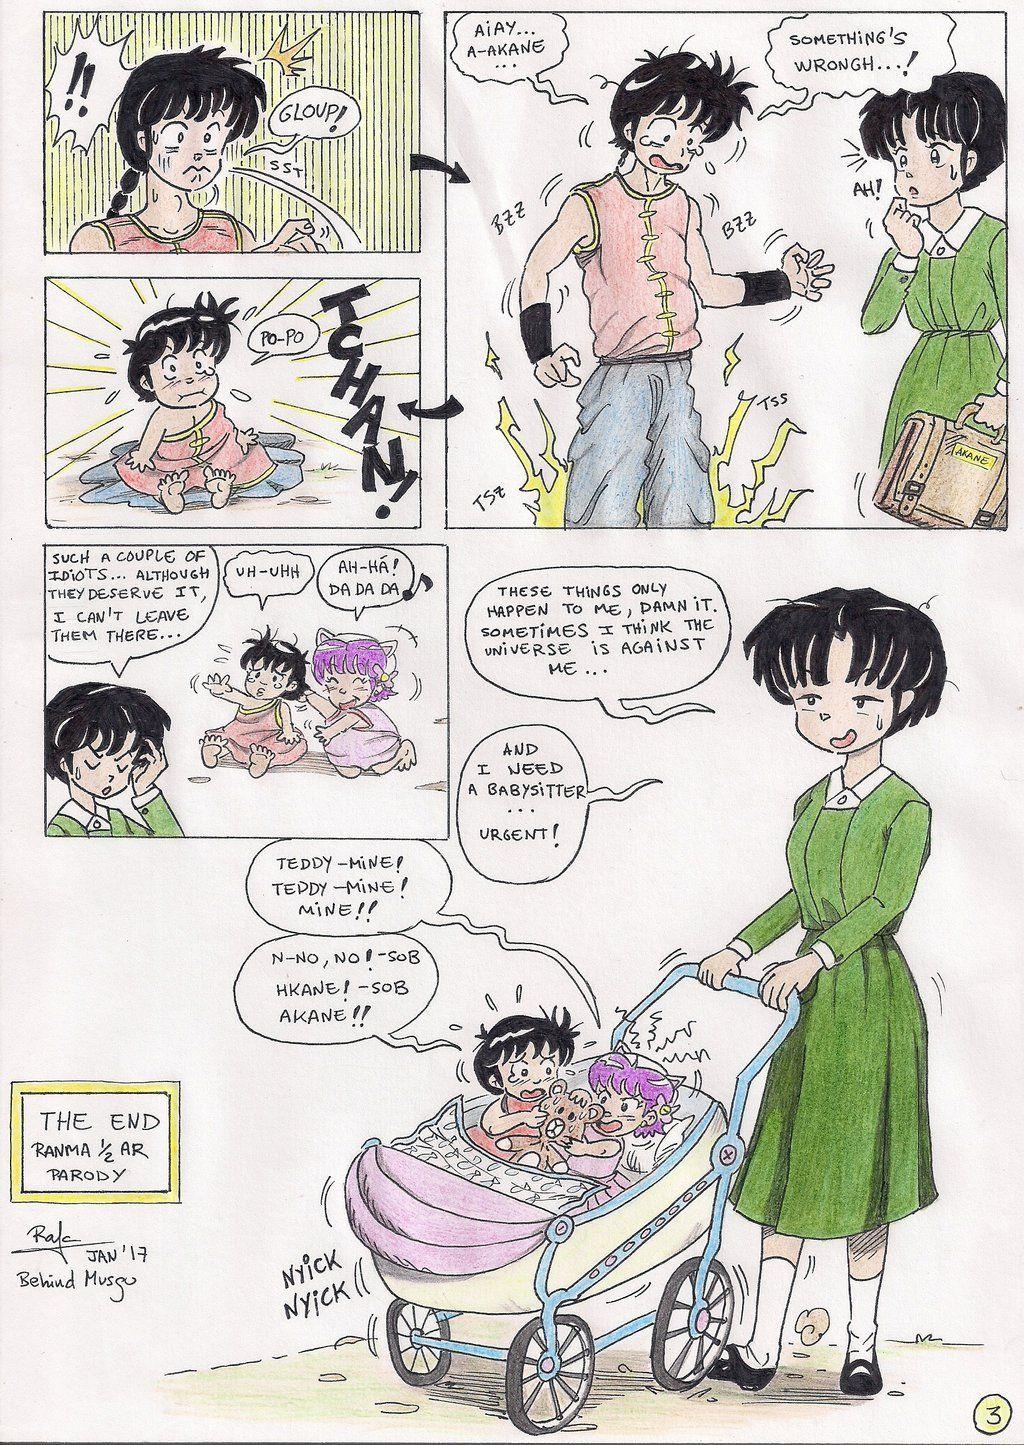 Ranma 1 2 Ar Parody 3 3 By Behindmusgo On Deviantart